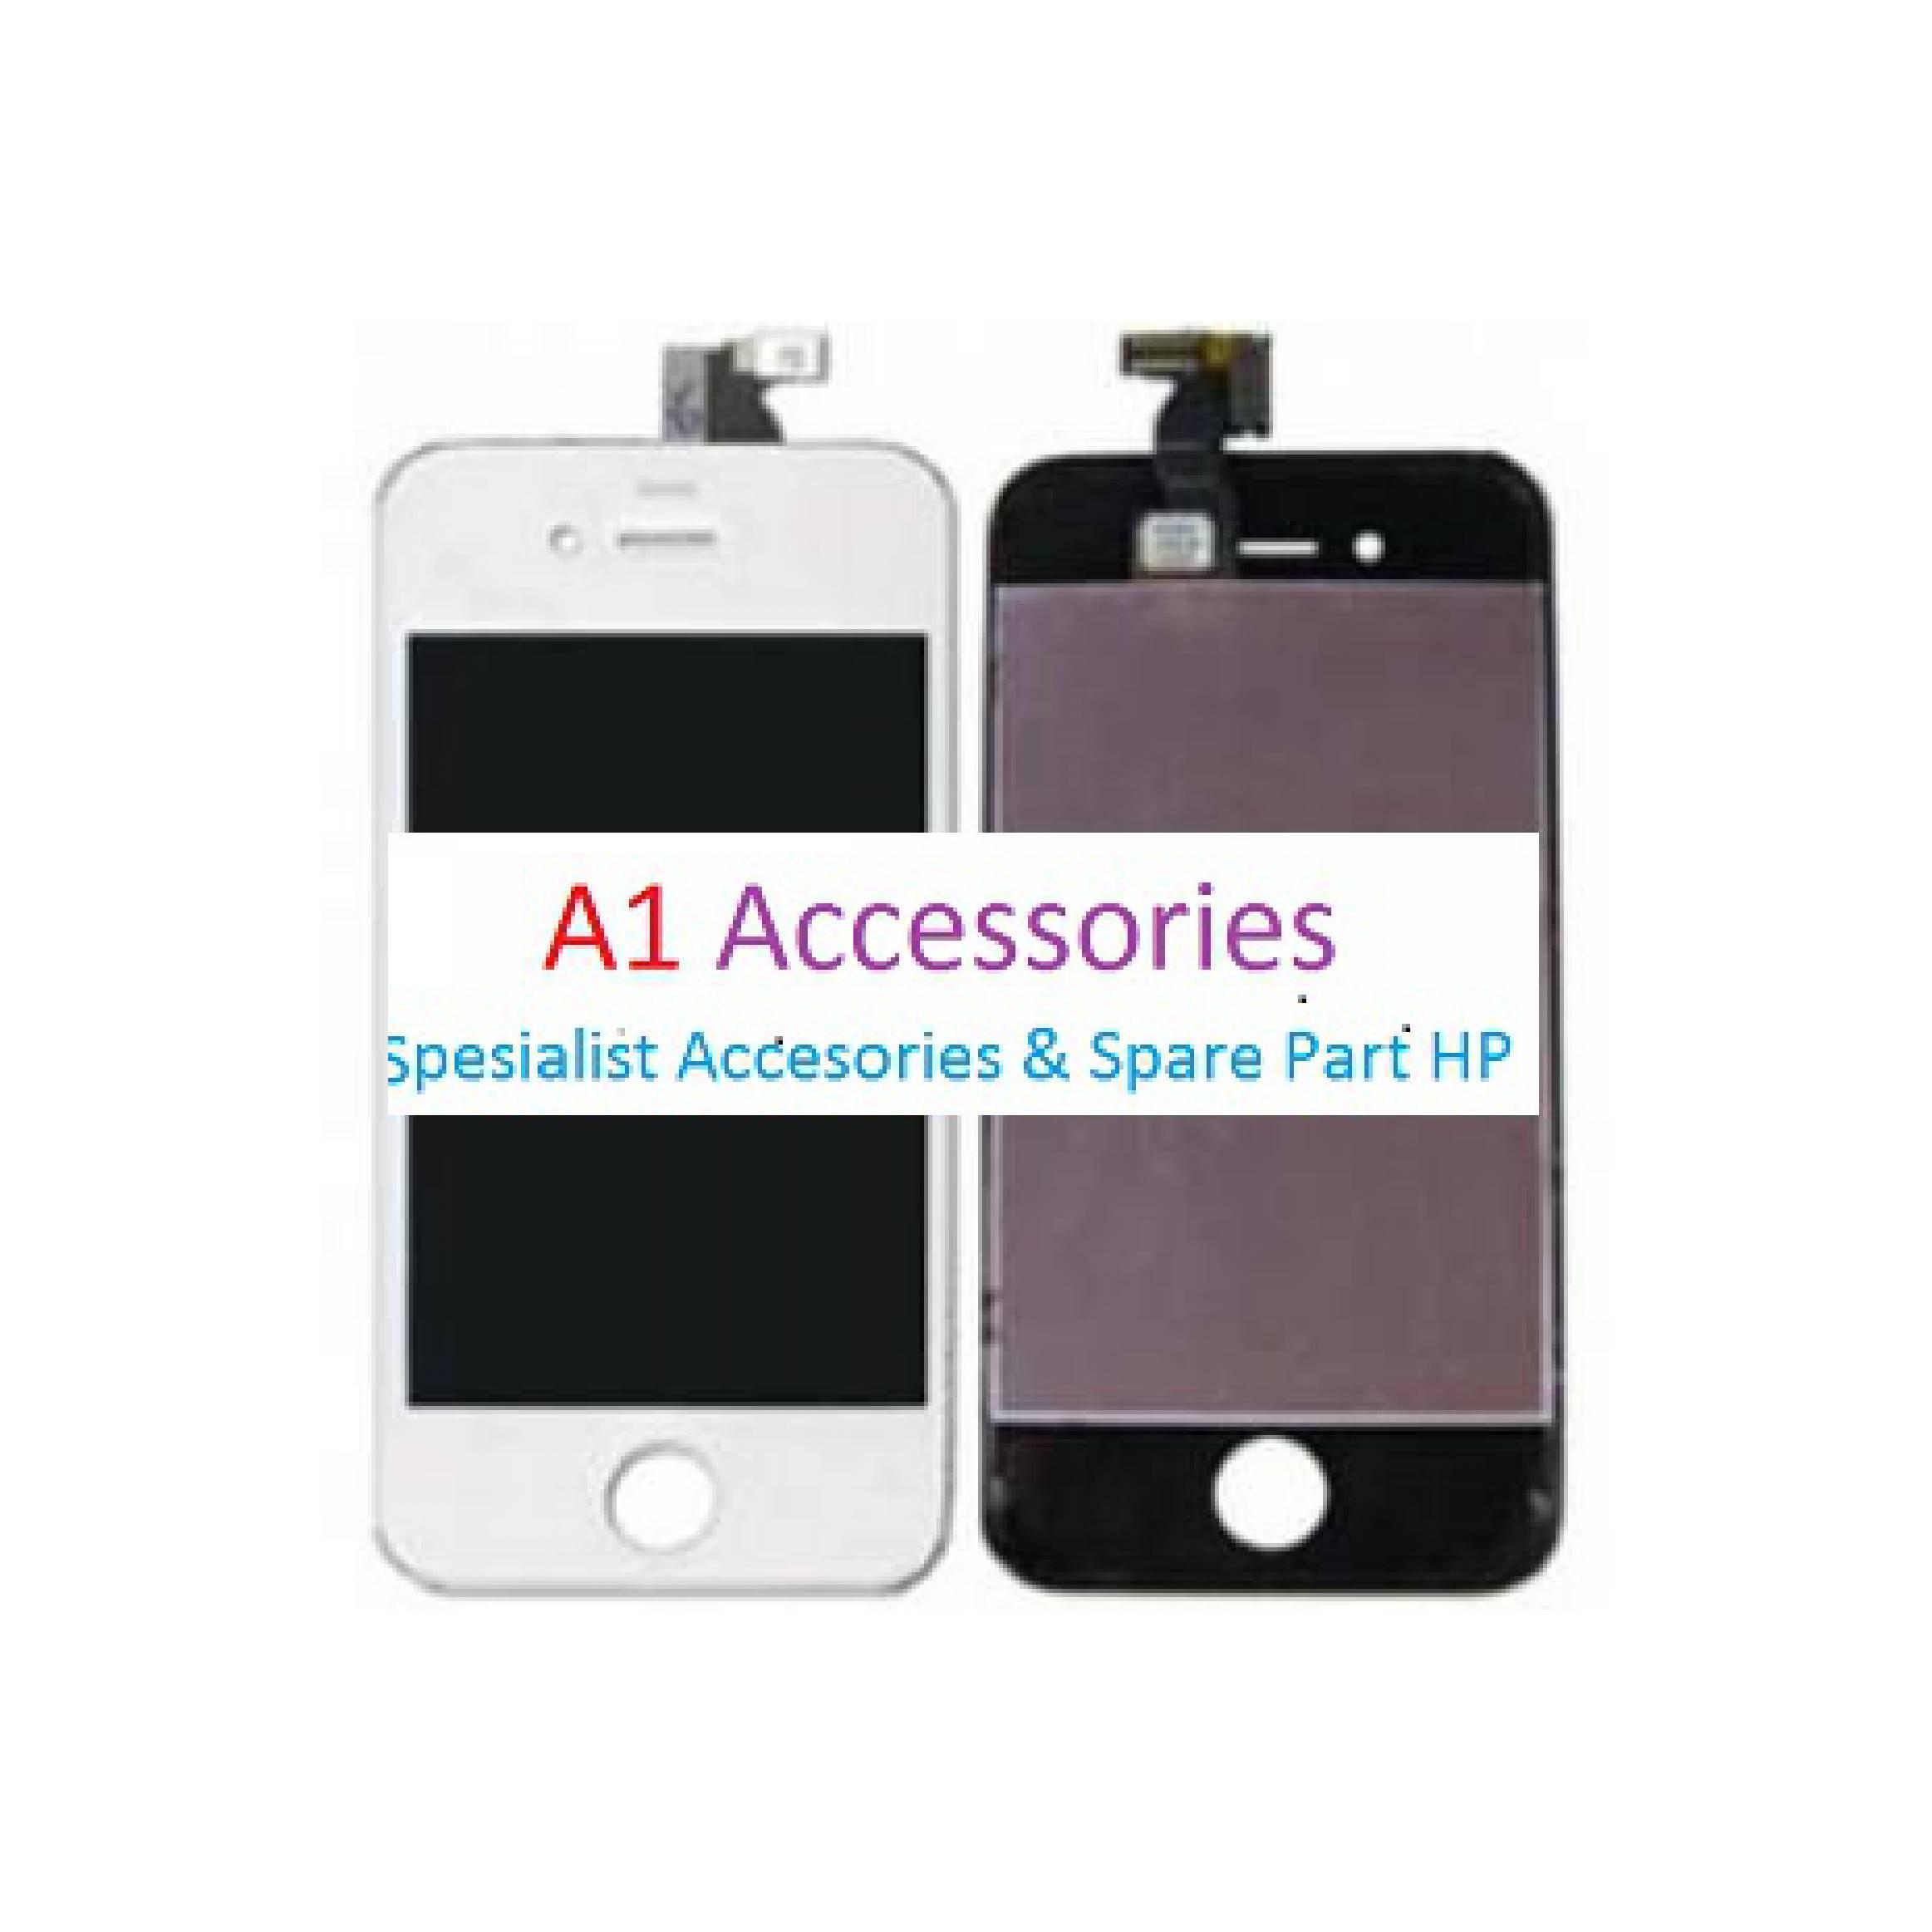 LCD + Touch Screen iPhone 4 ( Black / White Screen Original ) - CDMA